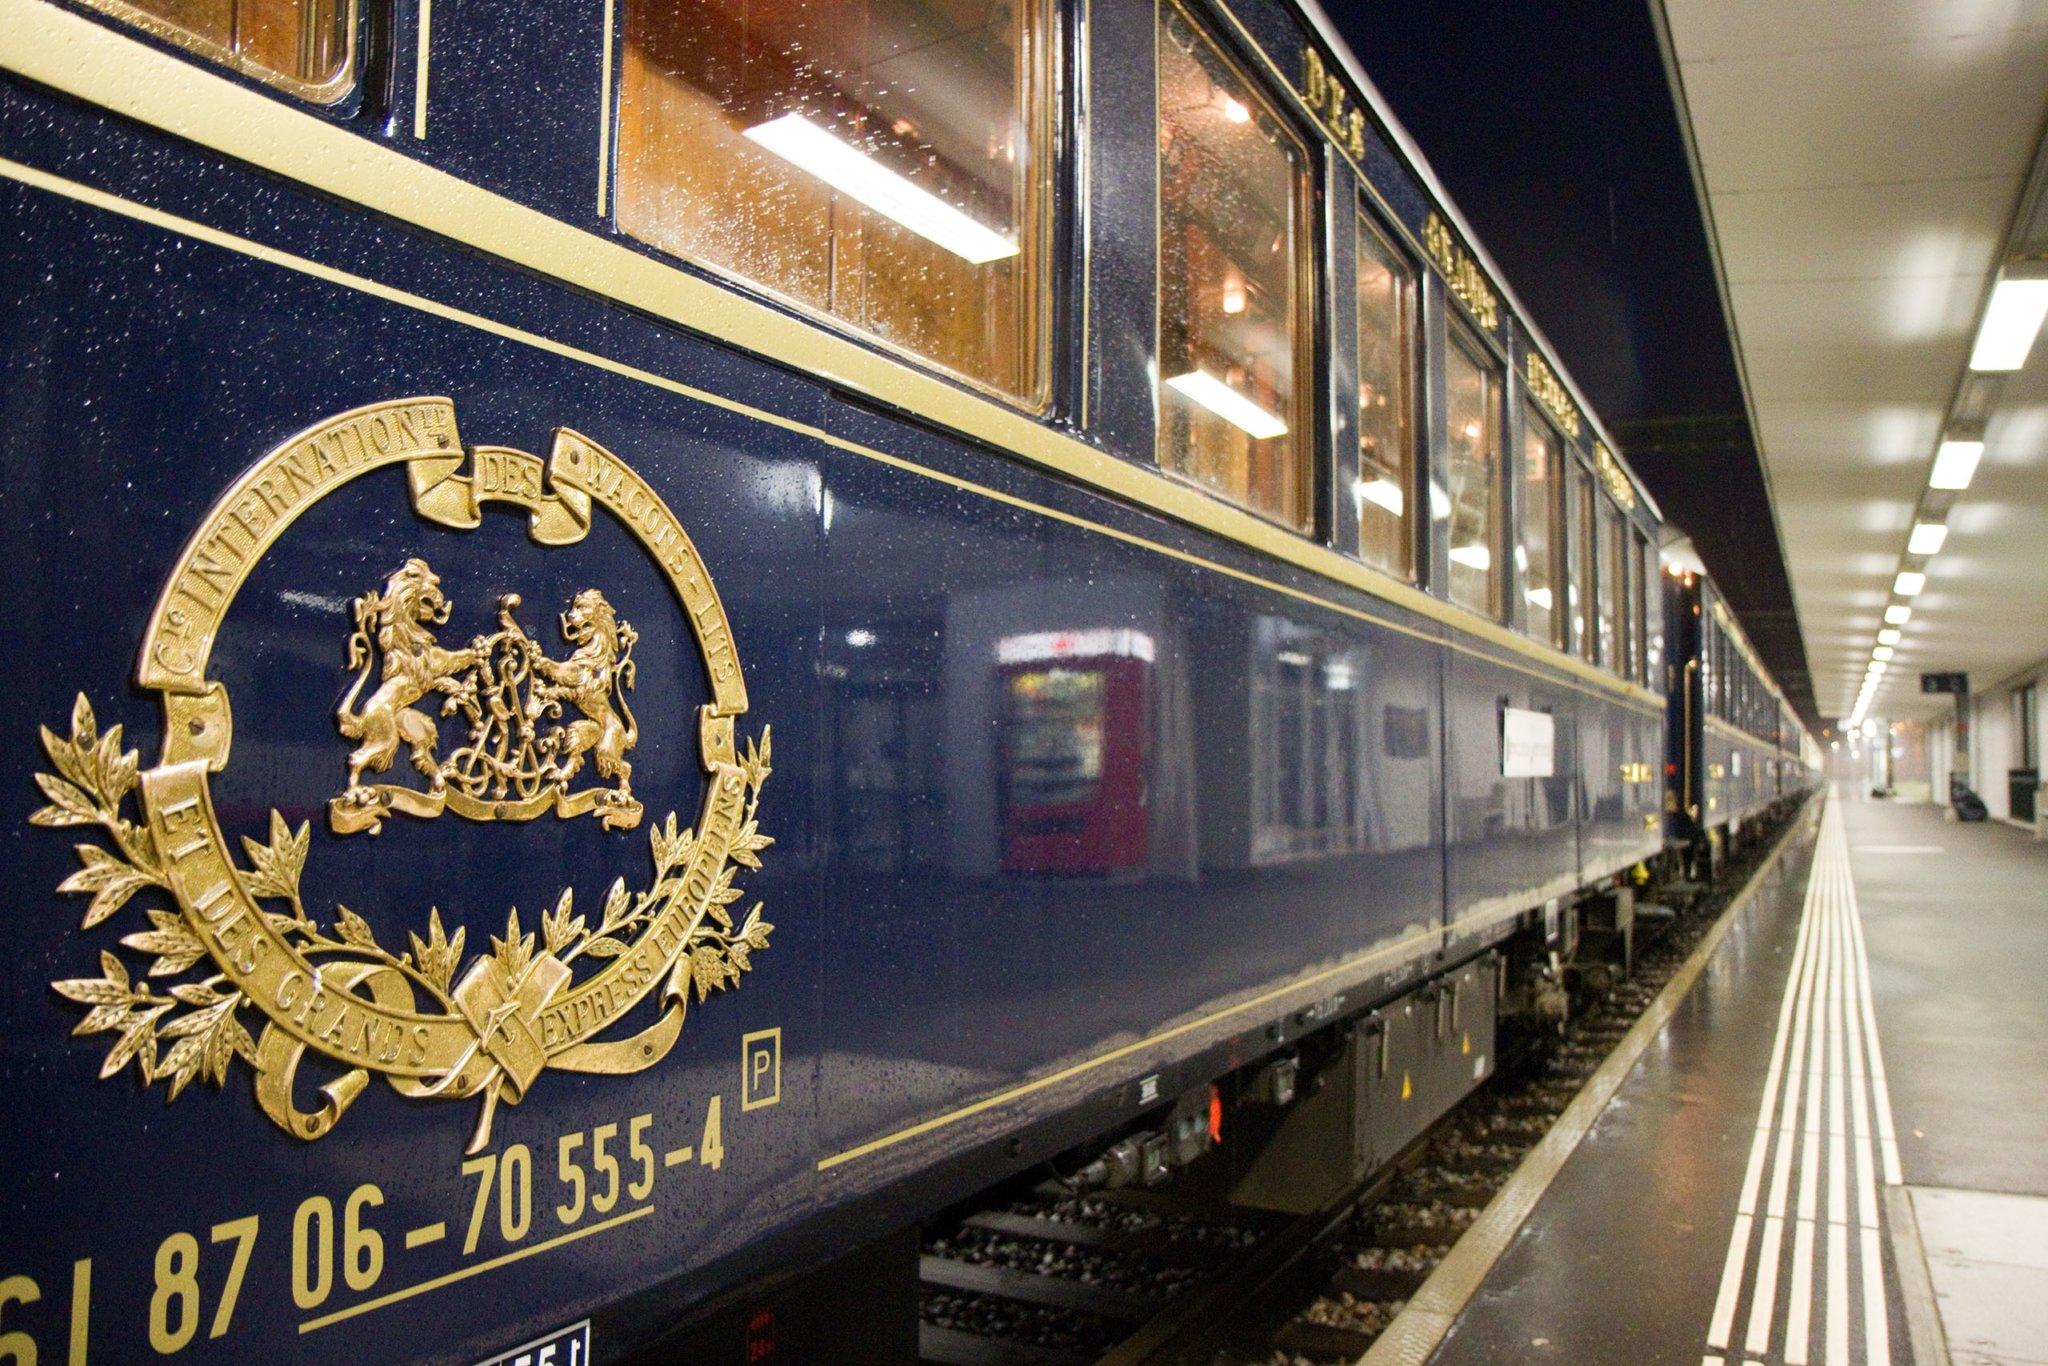 Orient Express Rolling Stock Carriage External